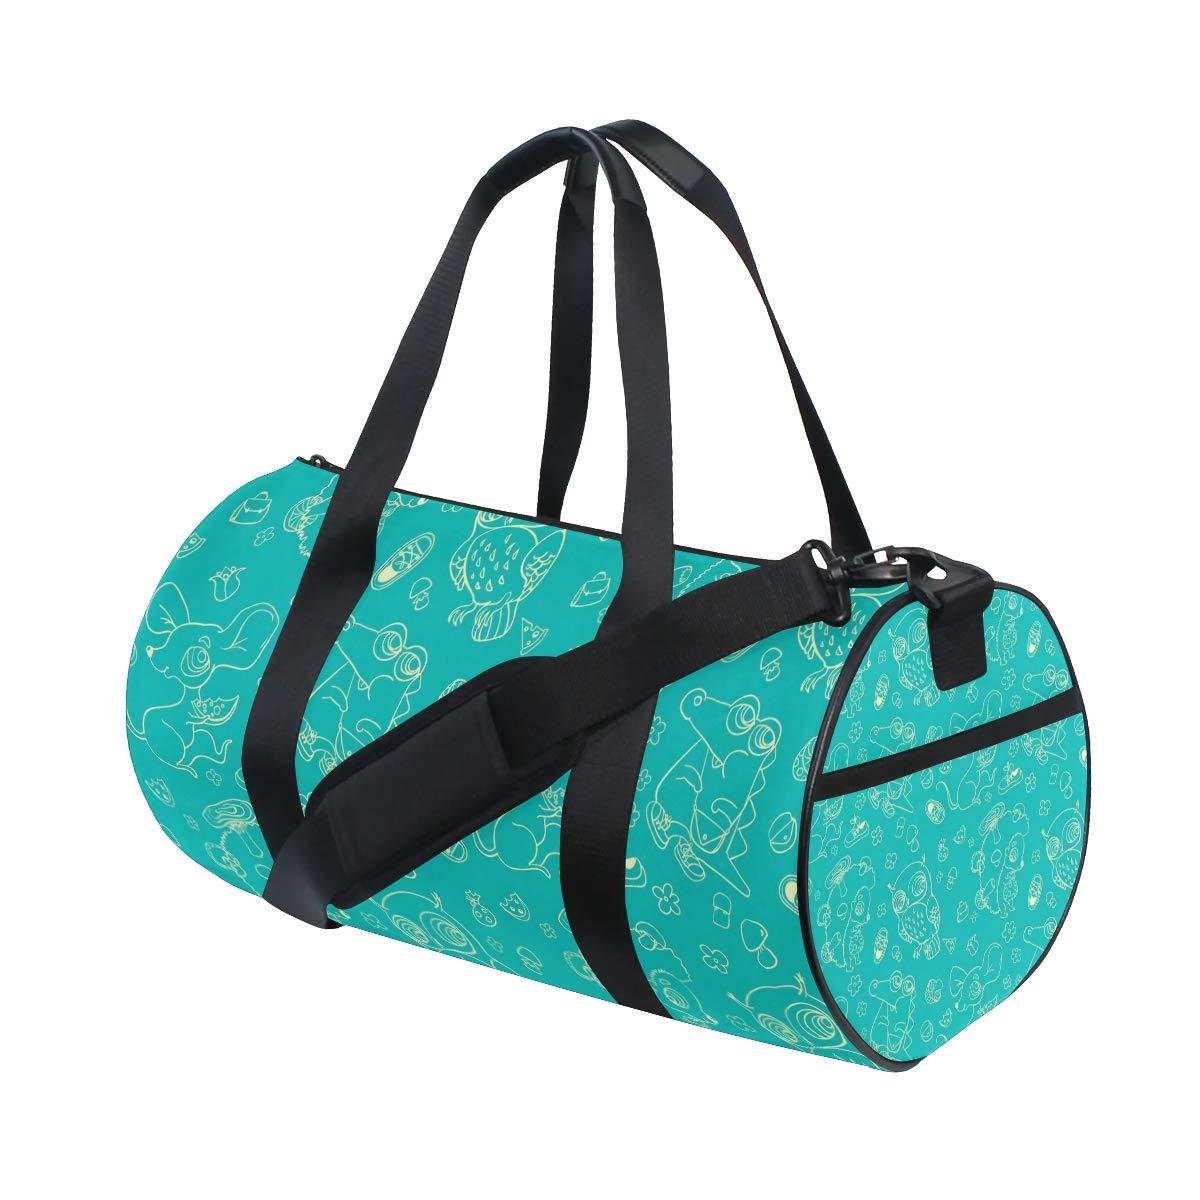 Unisex's Crocodile Duffel Bag Travel Tote Luggage Bag Gym Sports Luggage Bag